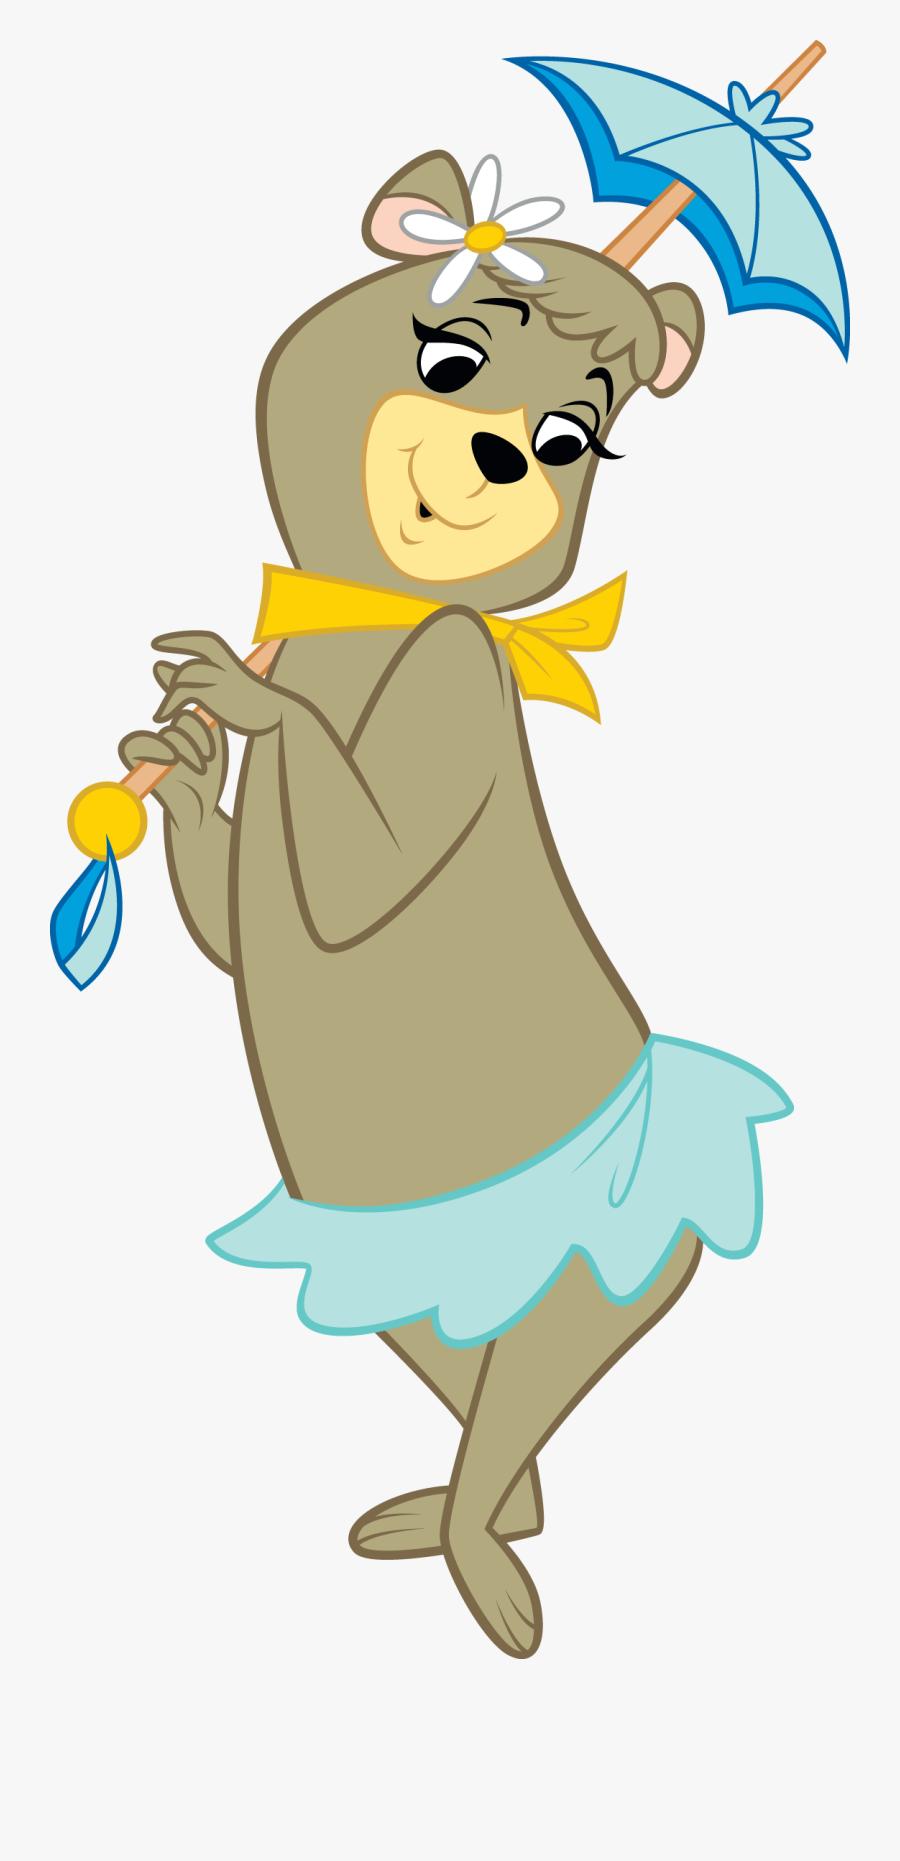 Google Image Result For Https Www Clipartkey Com Mpngs M 80 808108 Cindy Bear Cindy Bear Yogi Bear Png Yogi Bear Bear Character Superman Artwork